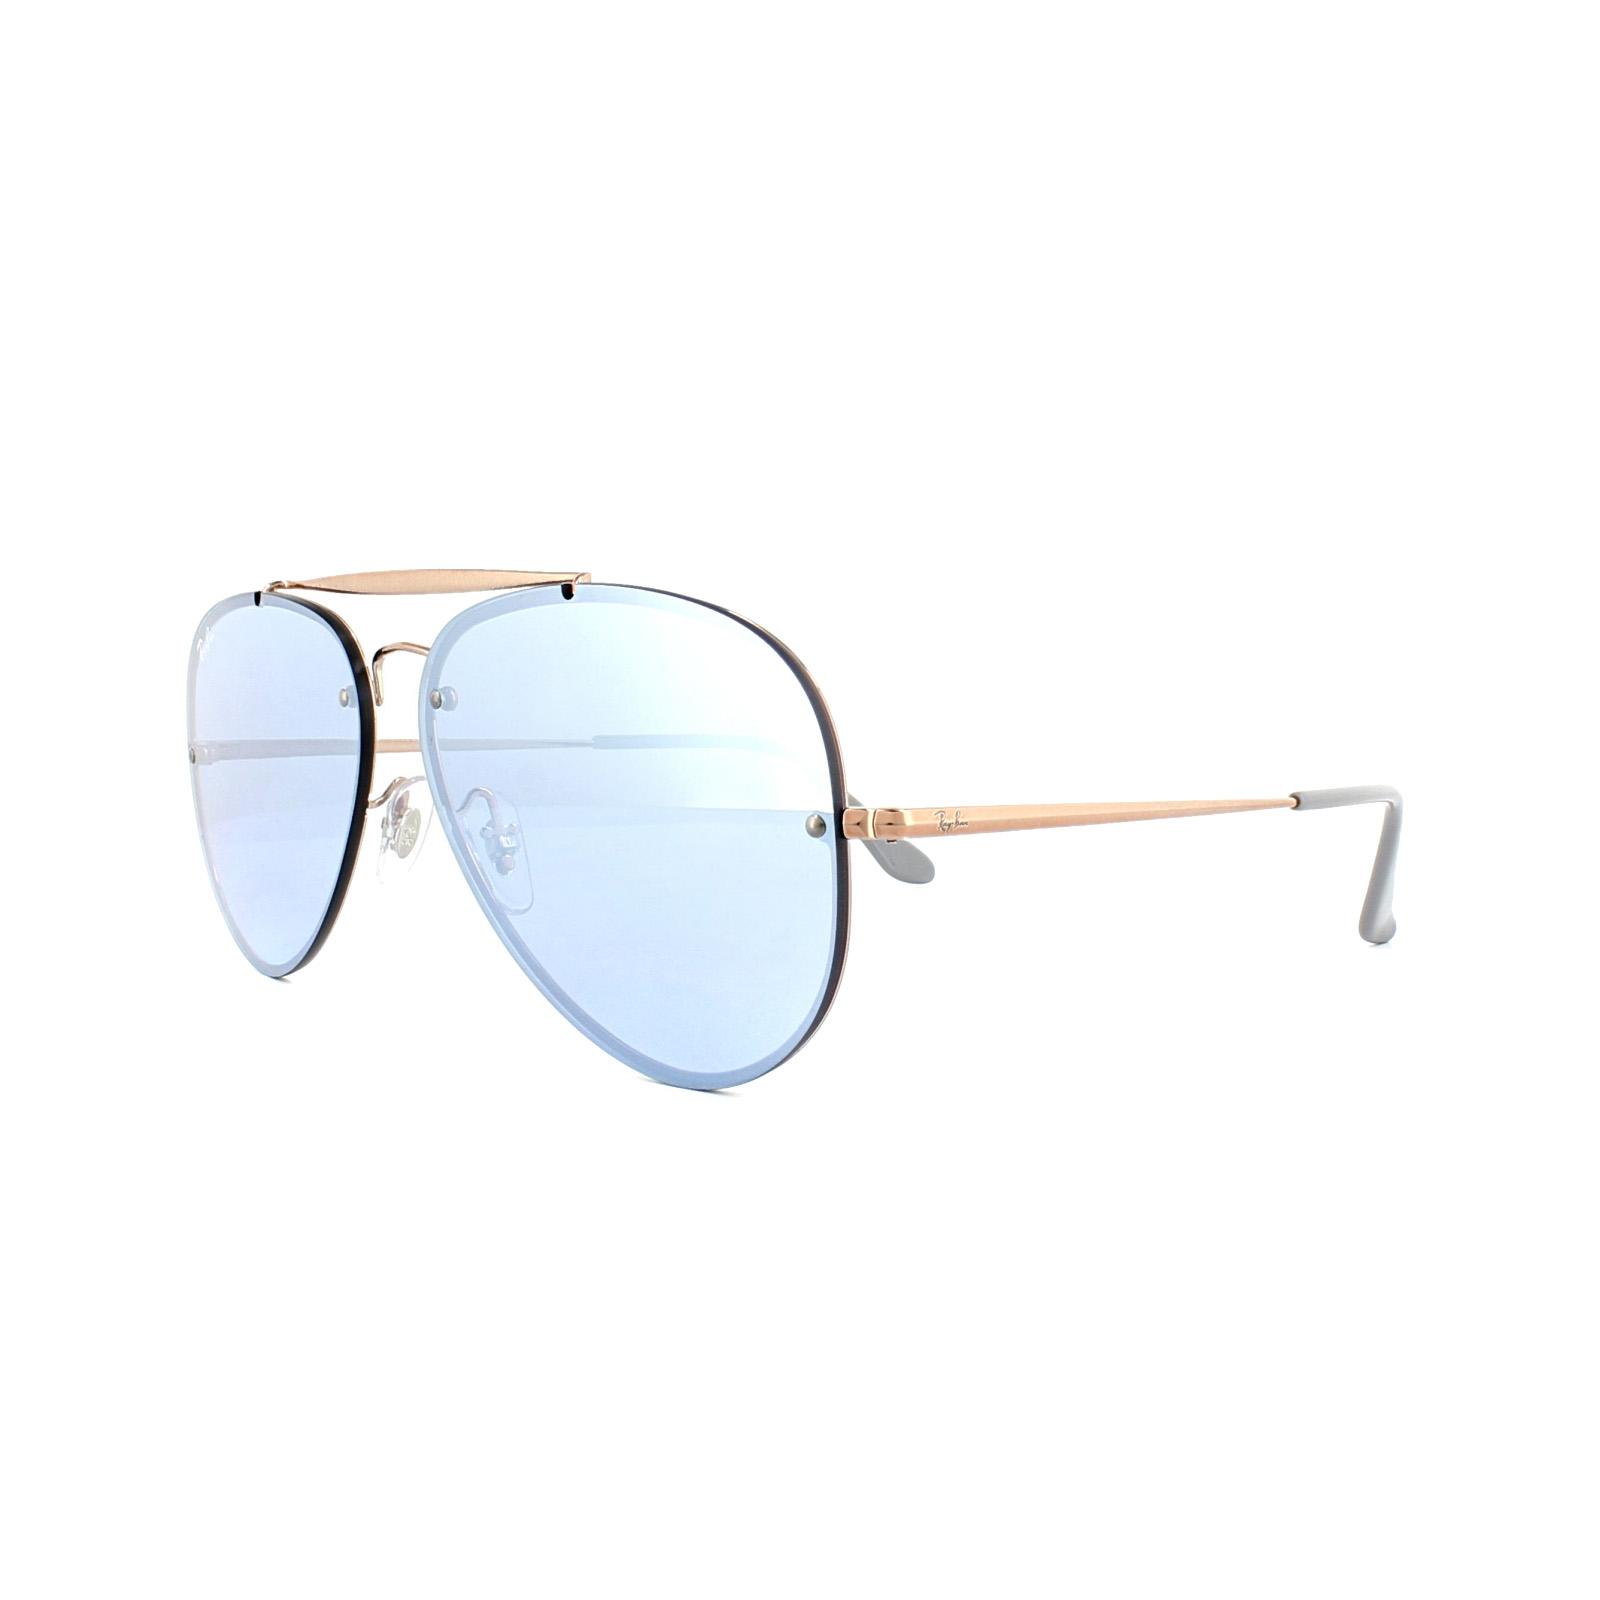 4d1be20819 Cheap Ray-Ban Blaze Aviator 3584N Sunglasses - Discounted Sunglasses